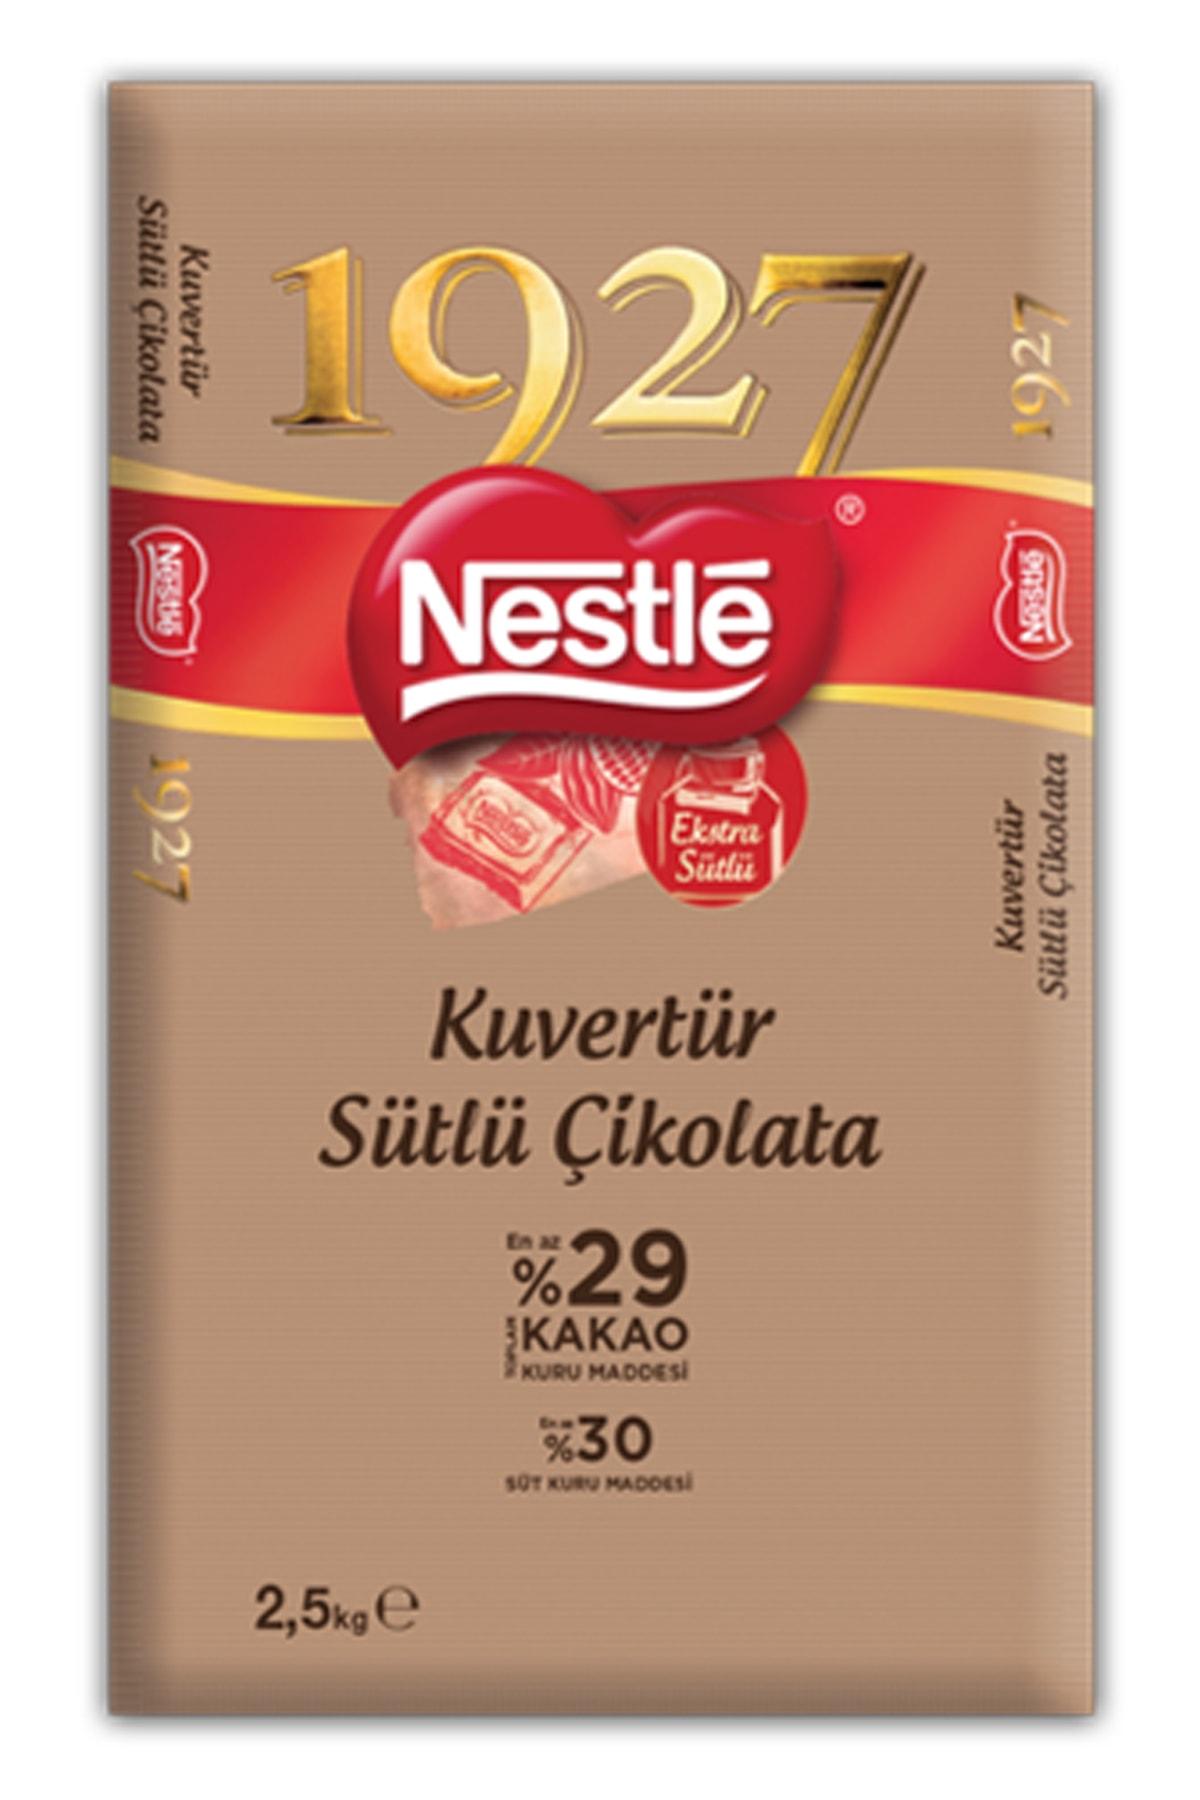 Nestle Nestlé 1927 Kuvertür Sütlü Çikolata 2.5kg 1